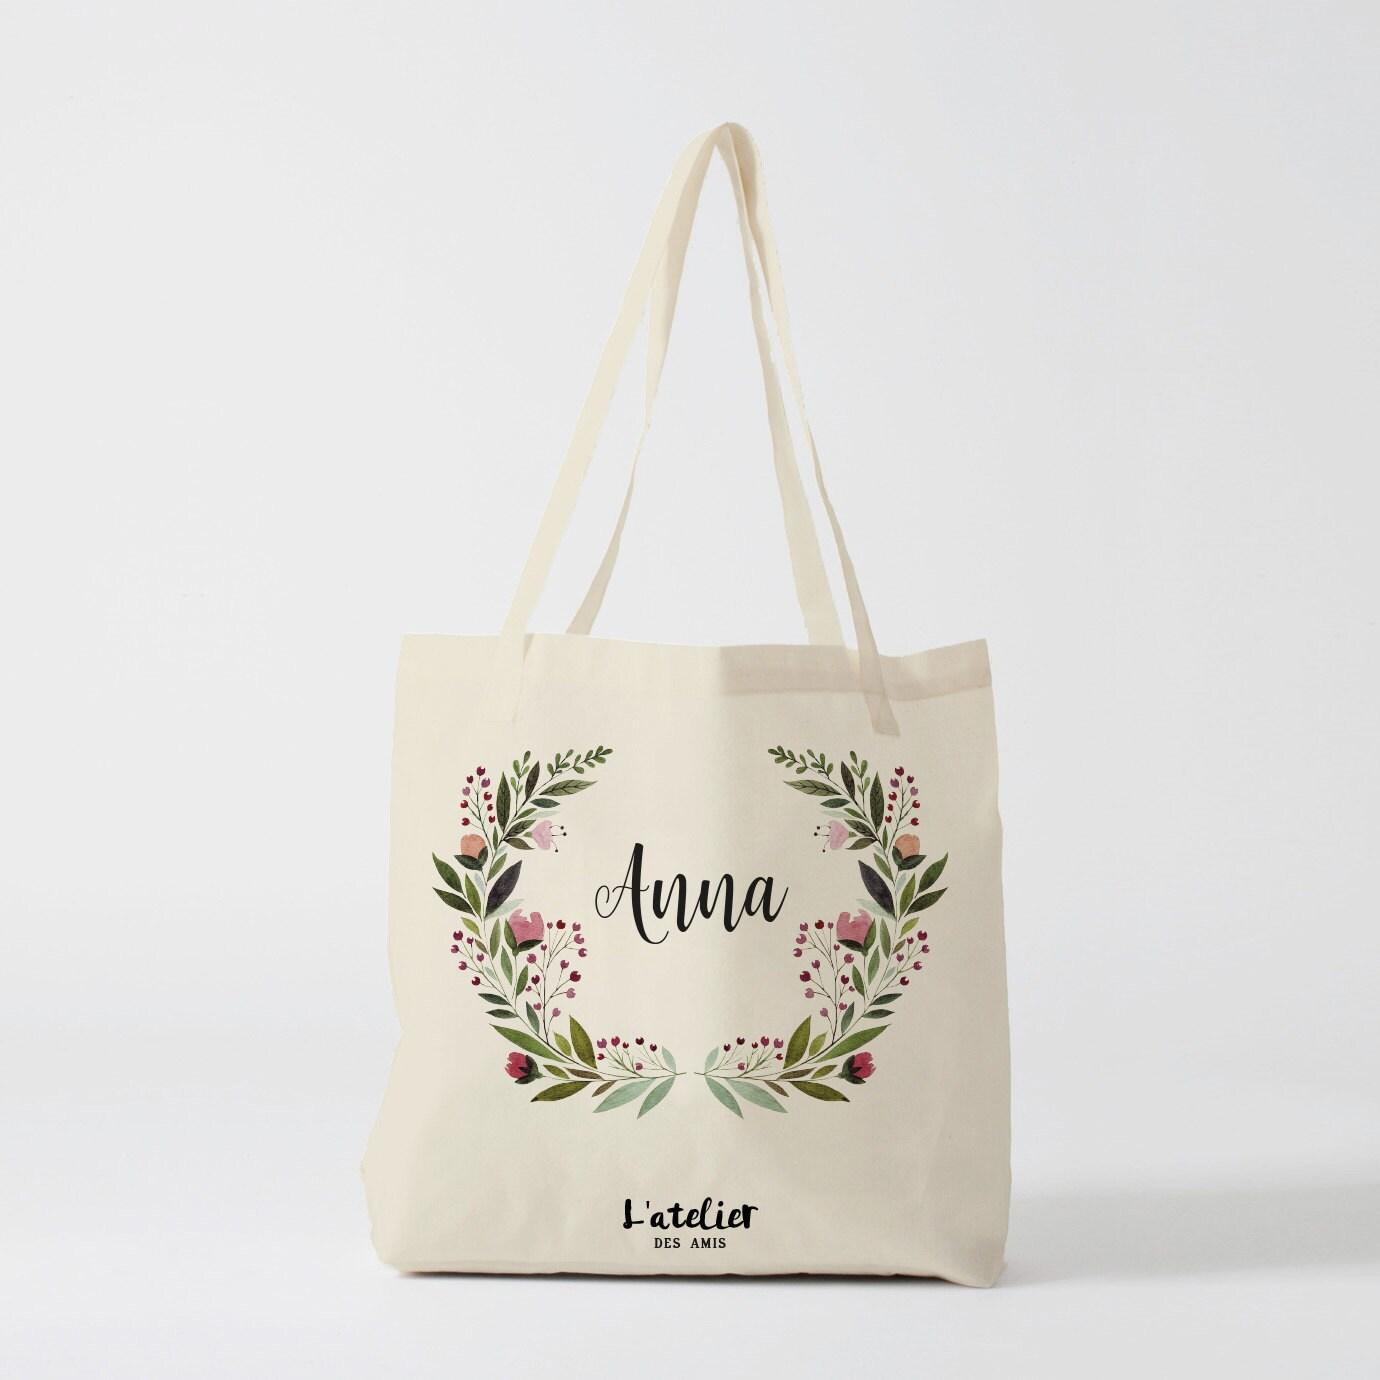 w106y tote bag personnalis sac de toile cabas sac. Black Bedroom Furniture Sets. Home Design Ideas